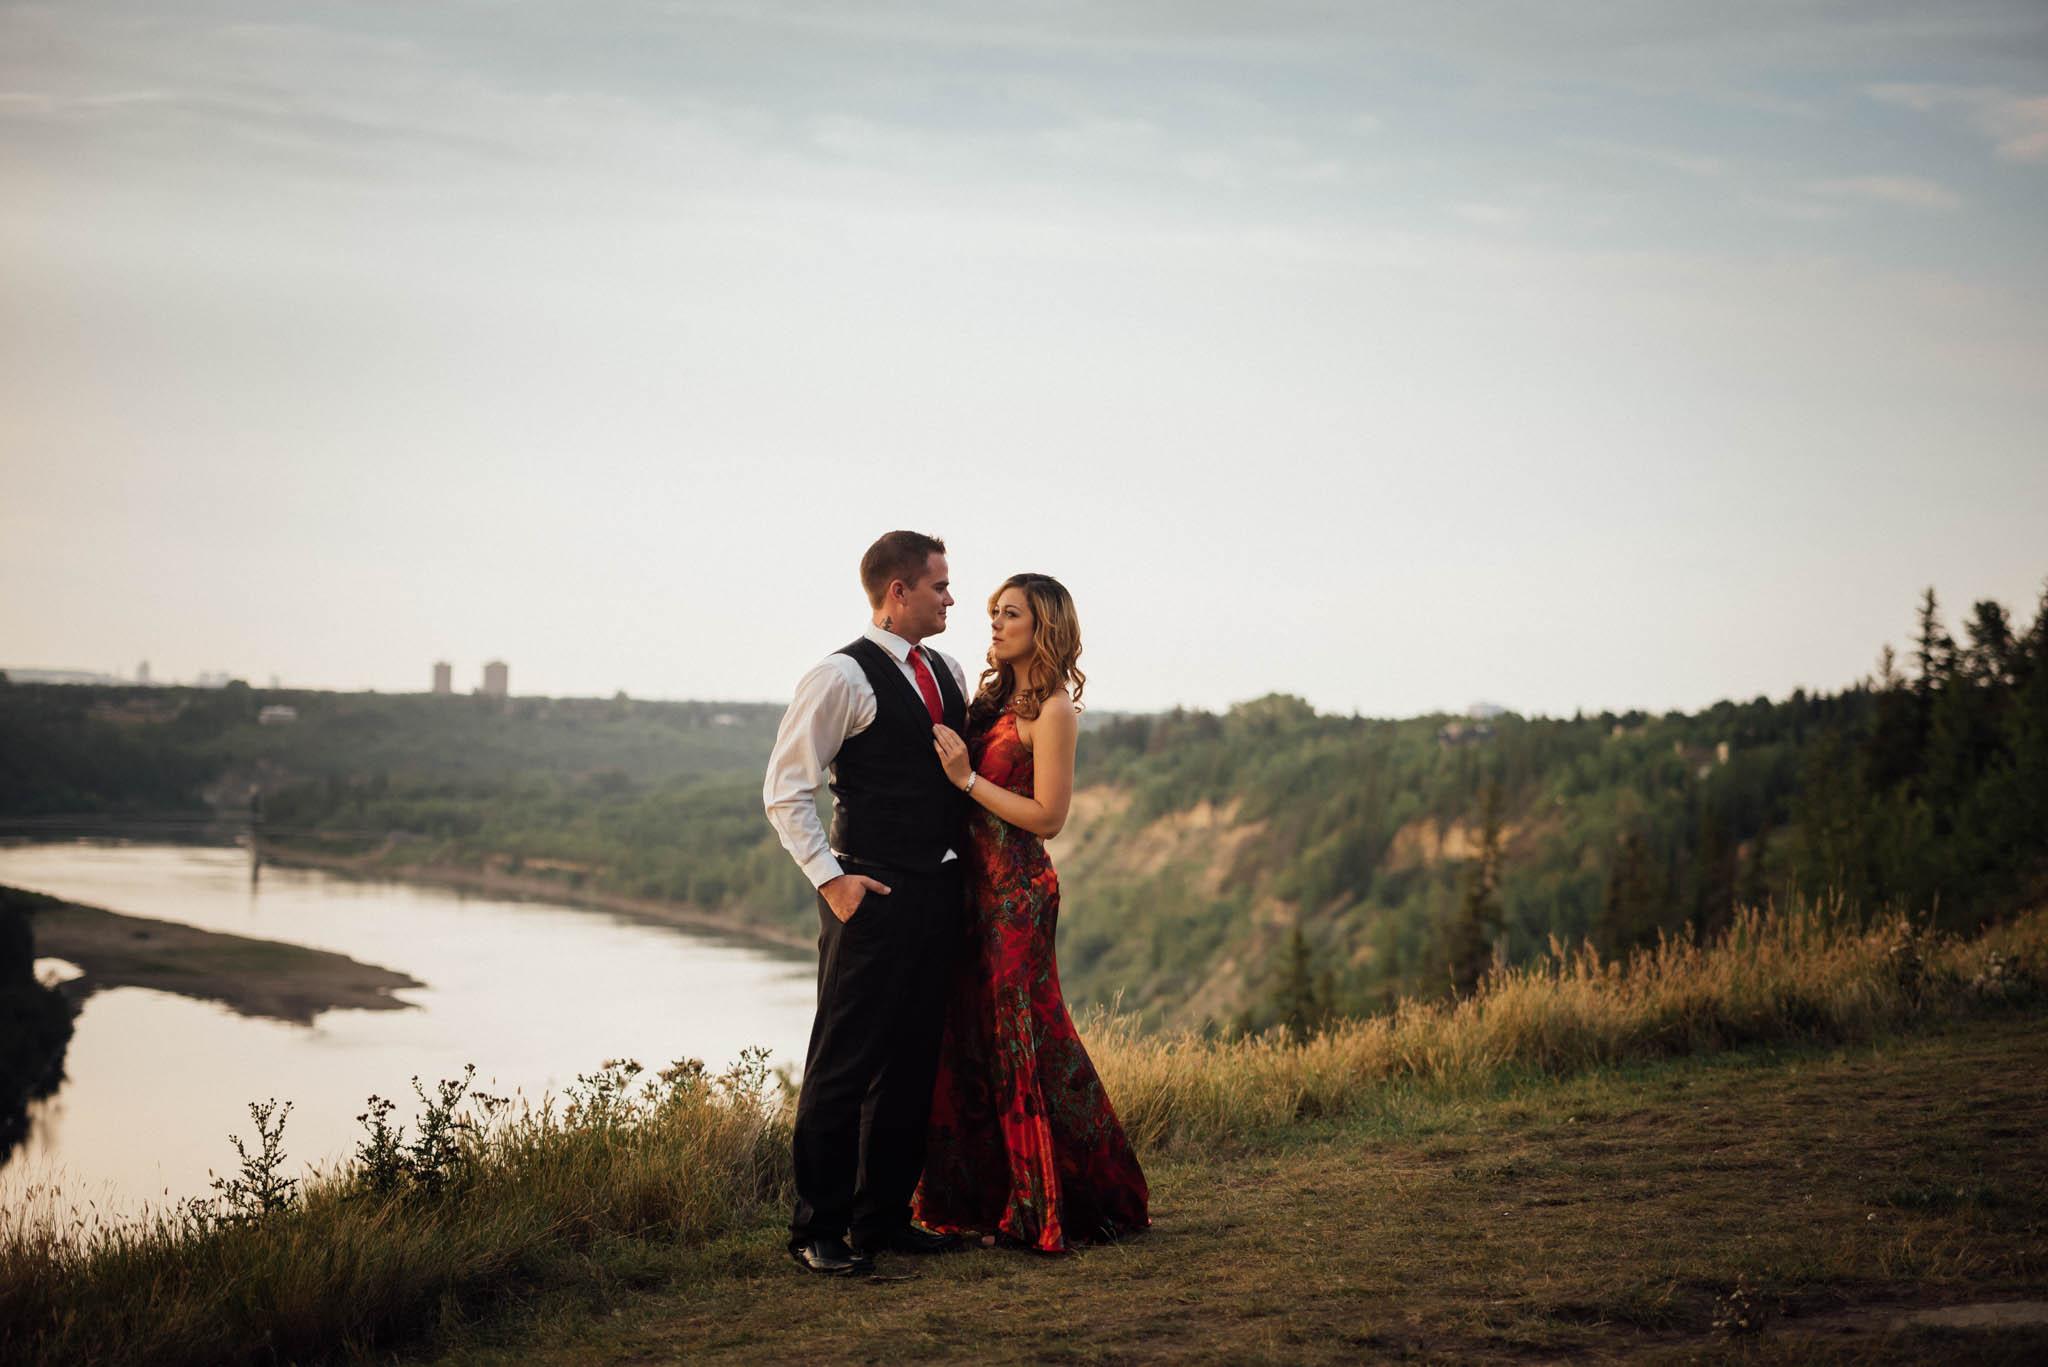 Edmonton-Wedding-Photographers-Box Cube-Photography-Sharyar-Memon-3308